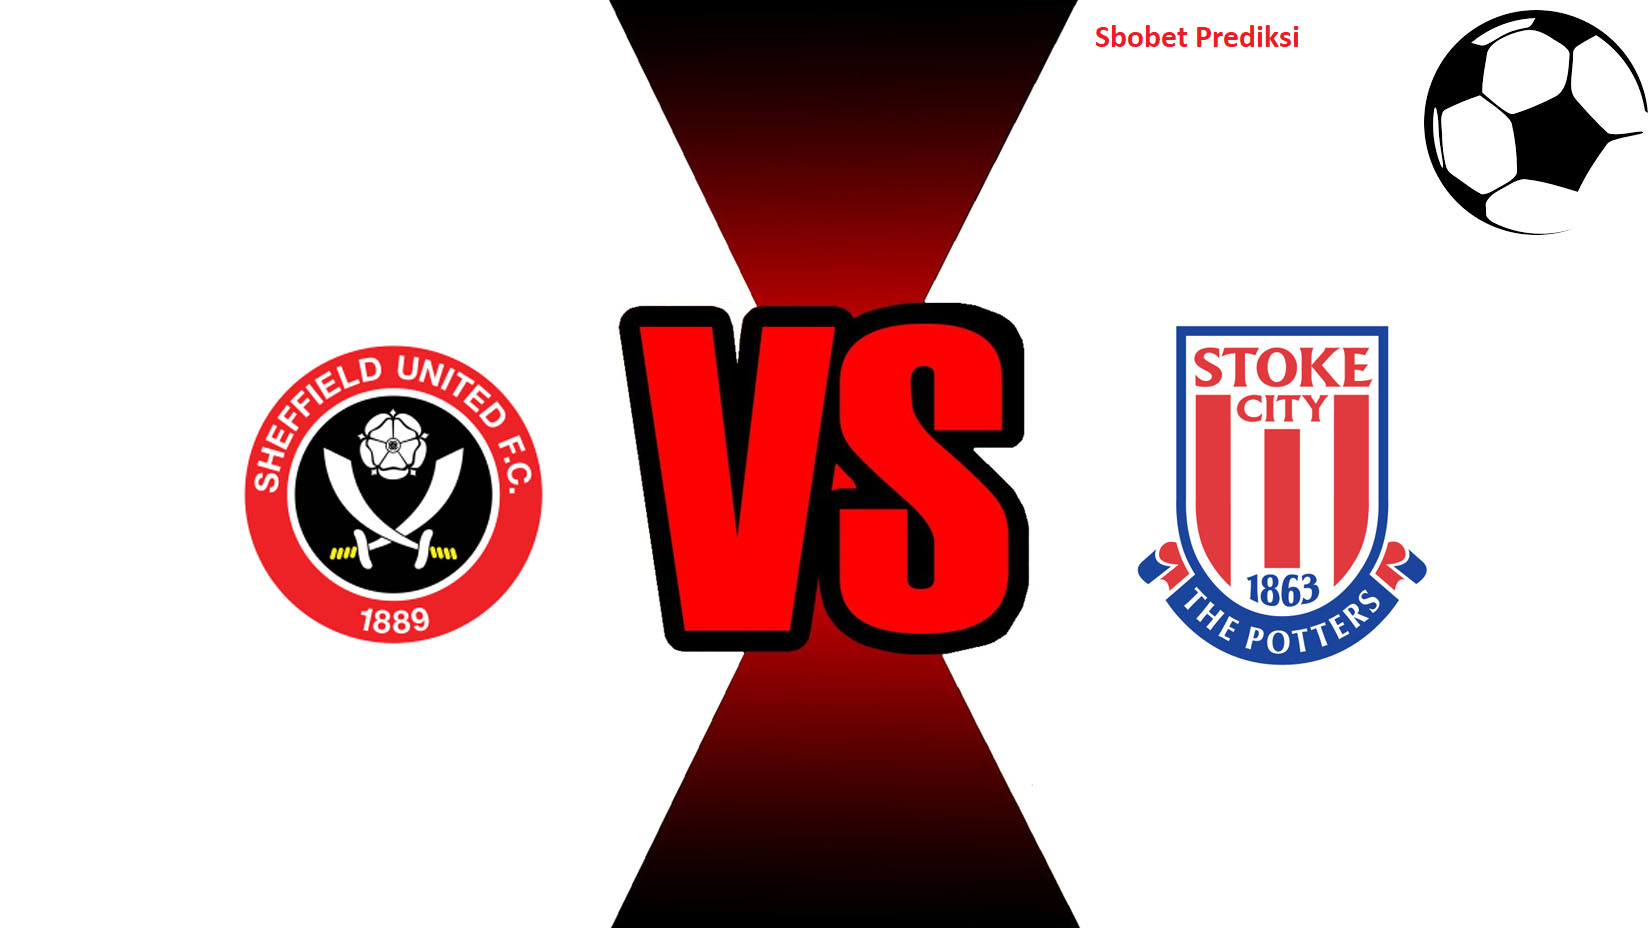 Prediksi Skor Bola Online Sheffield Uninted vs Stoke City 24 Oktober 2018